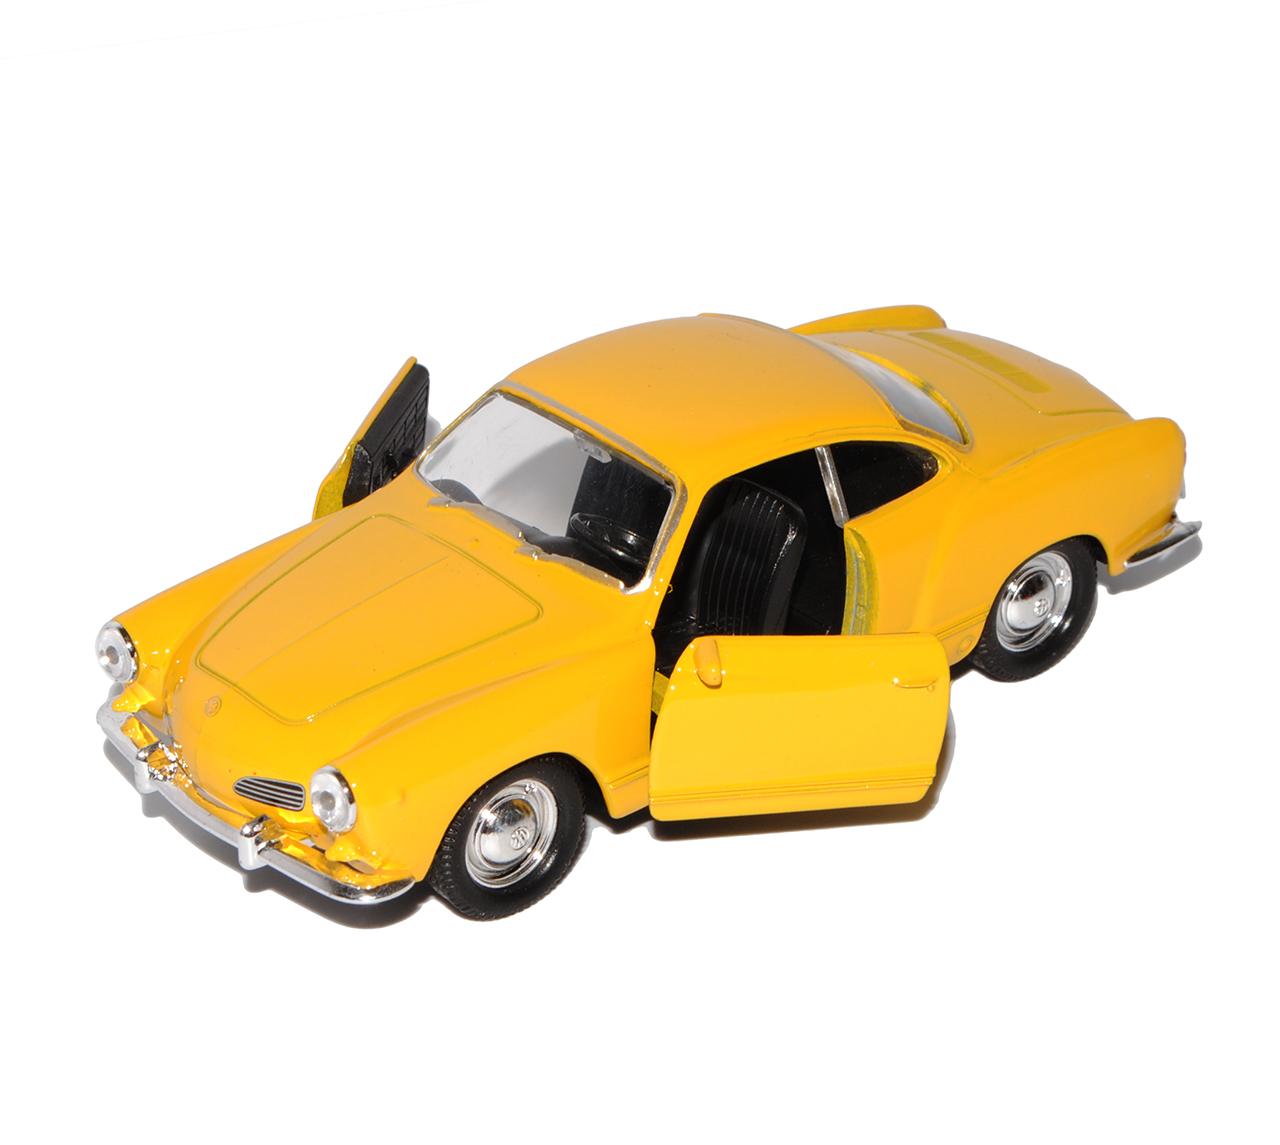 43 1//36-1//46 modelo welly auto con... VW Volkswagen Karmann Ghia Coupe amarillo ca 1